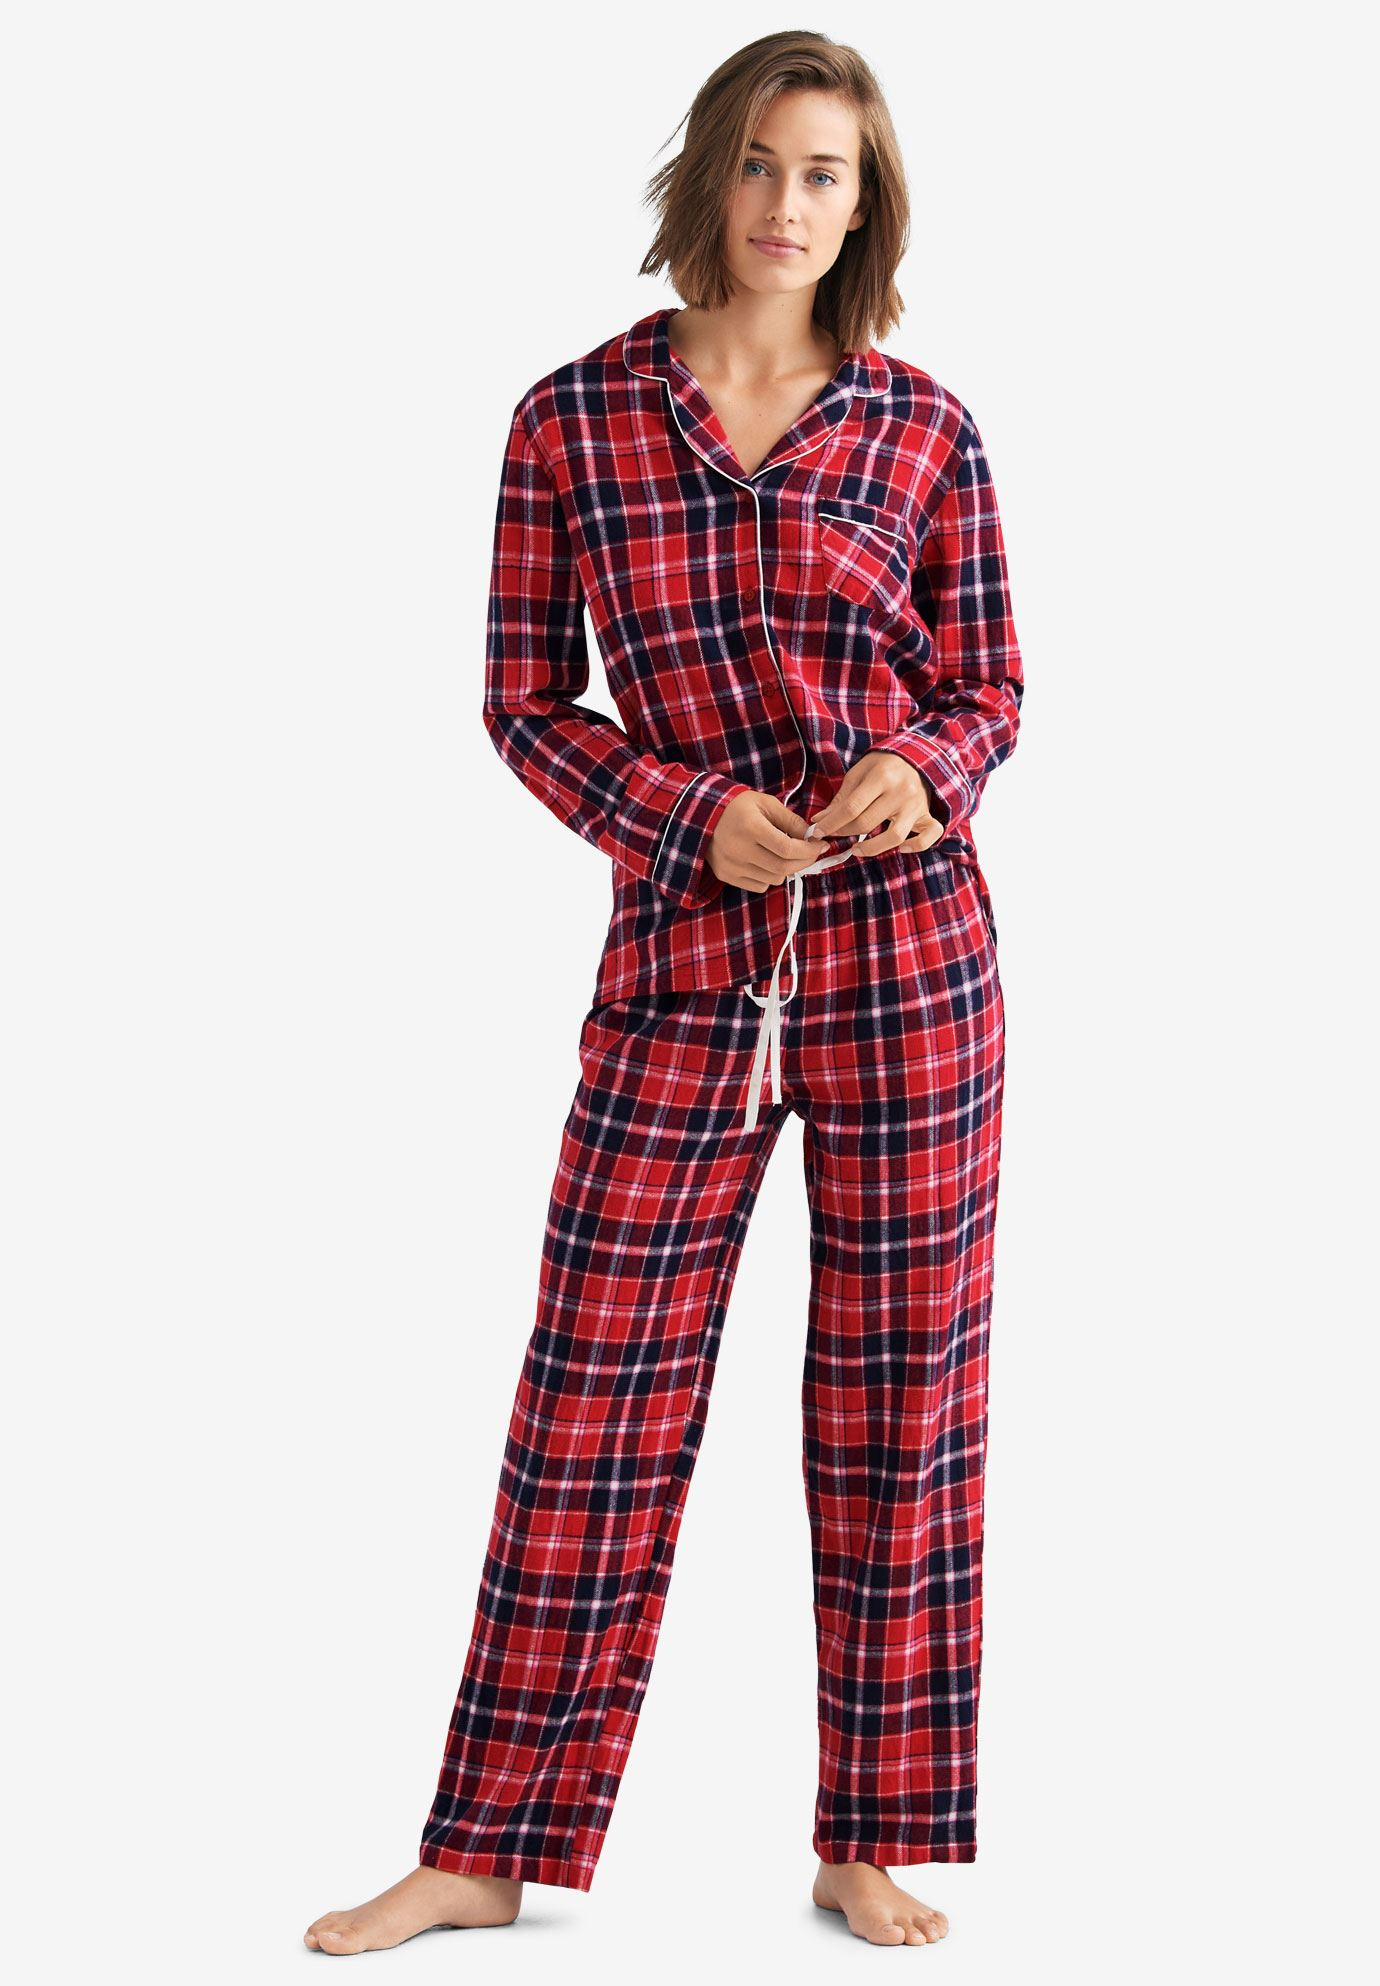 Plaid Flannel Pajama Set By Ellos 174 Plus Size Sleepwear